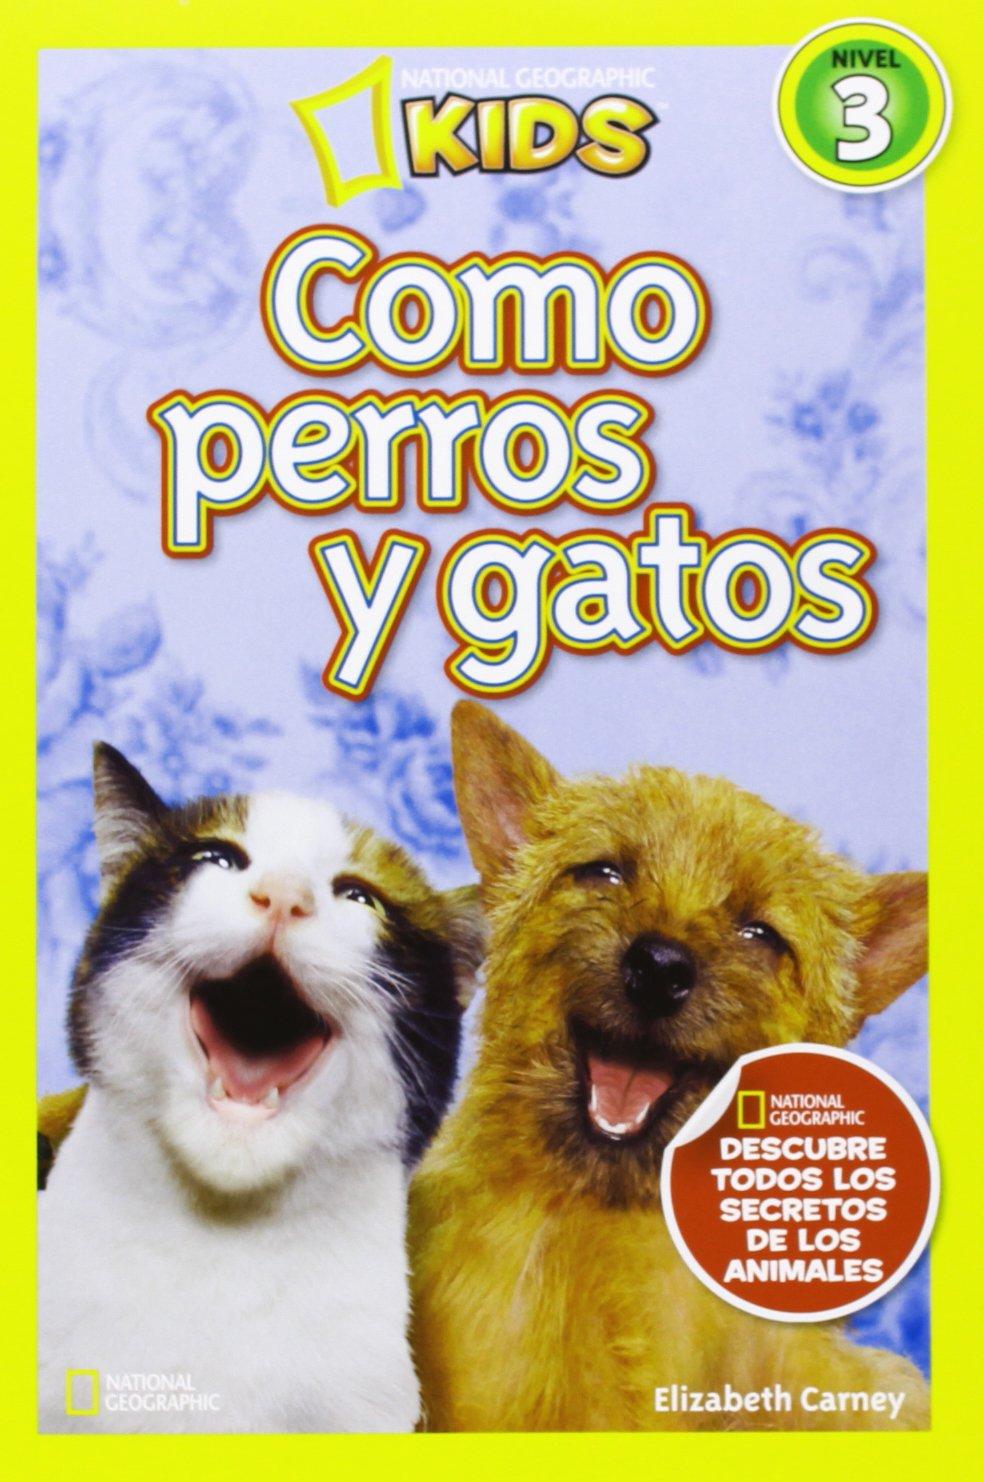 Como perros y gatos, nivel 3 (Spanish) Paperback – September 12, 2013